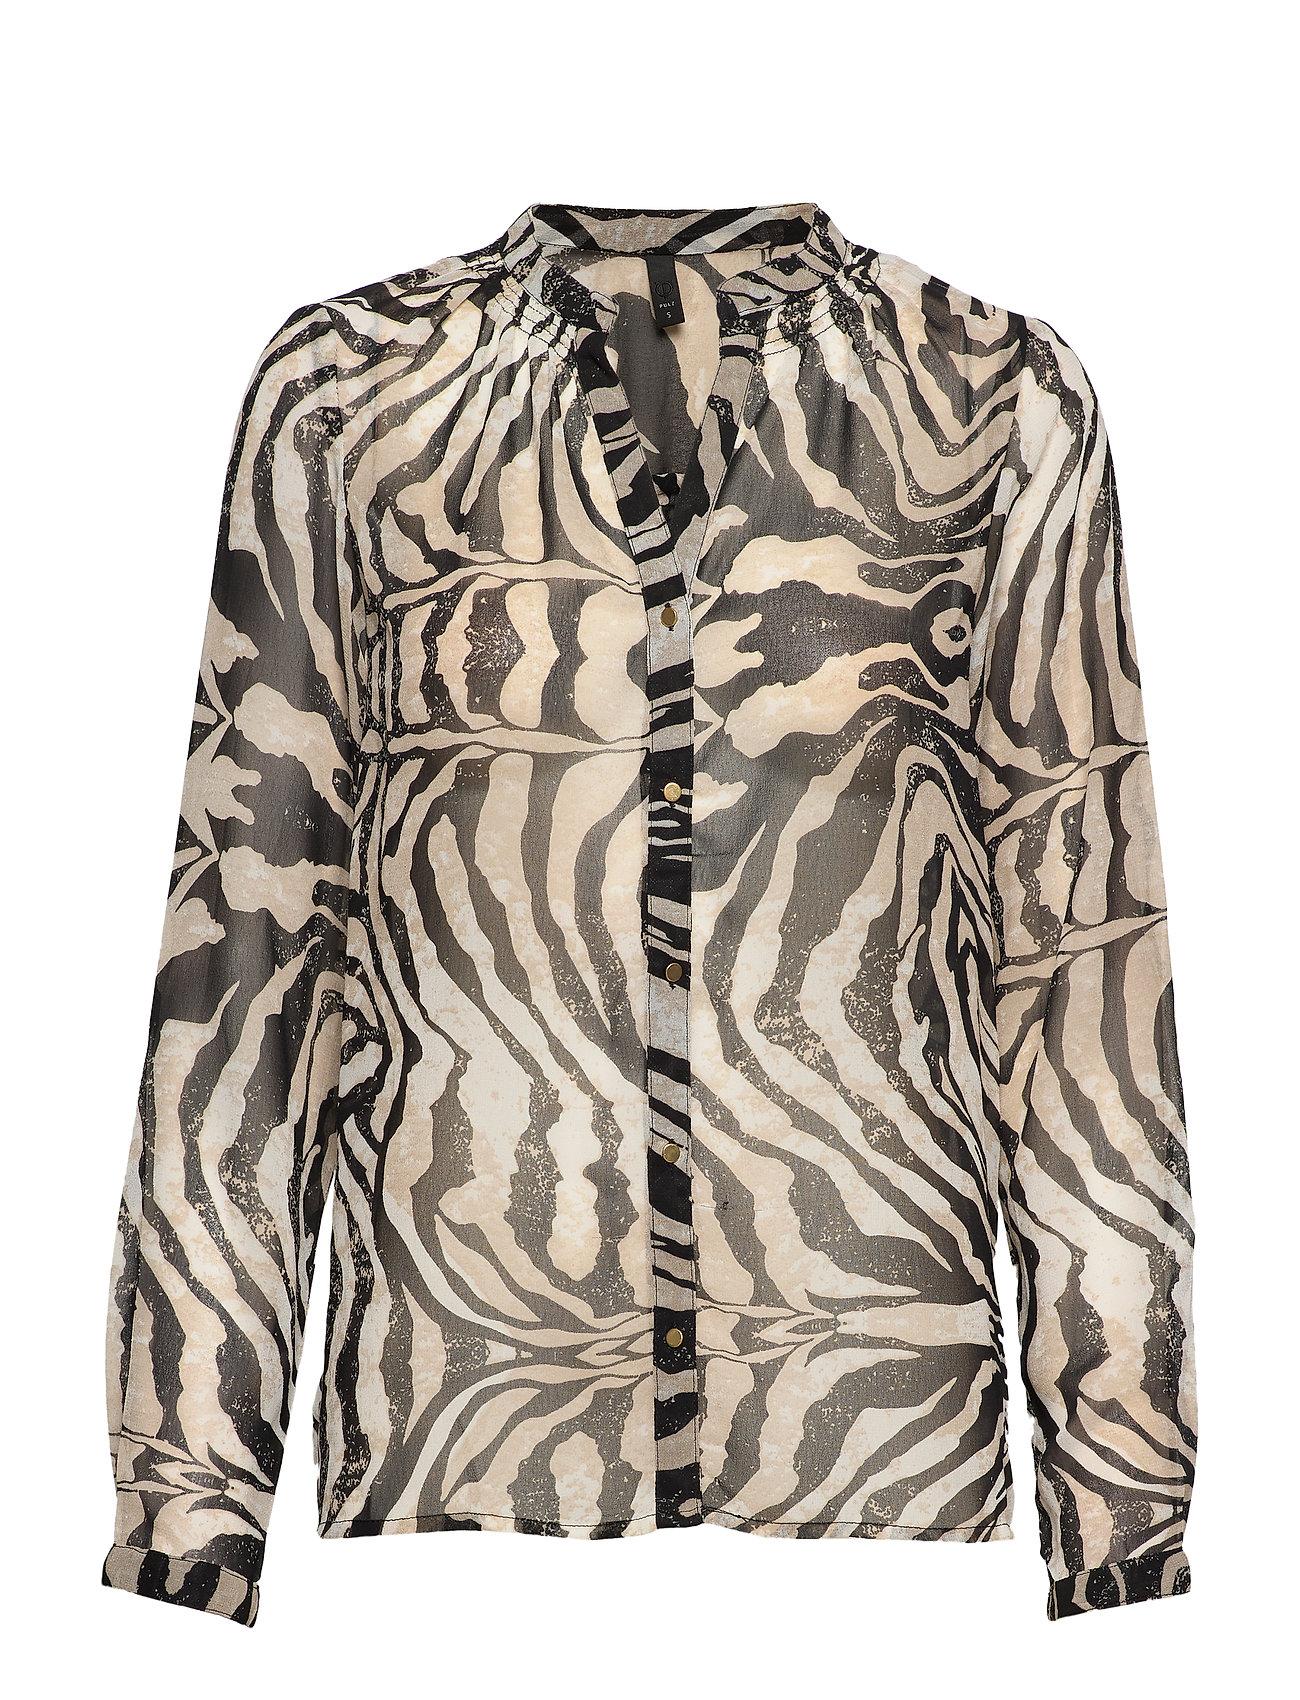 Pulz Jeans PZMANJA L/S Shirt - SOFT CREAM